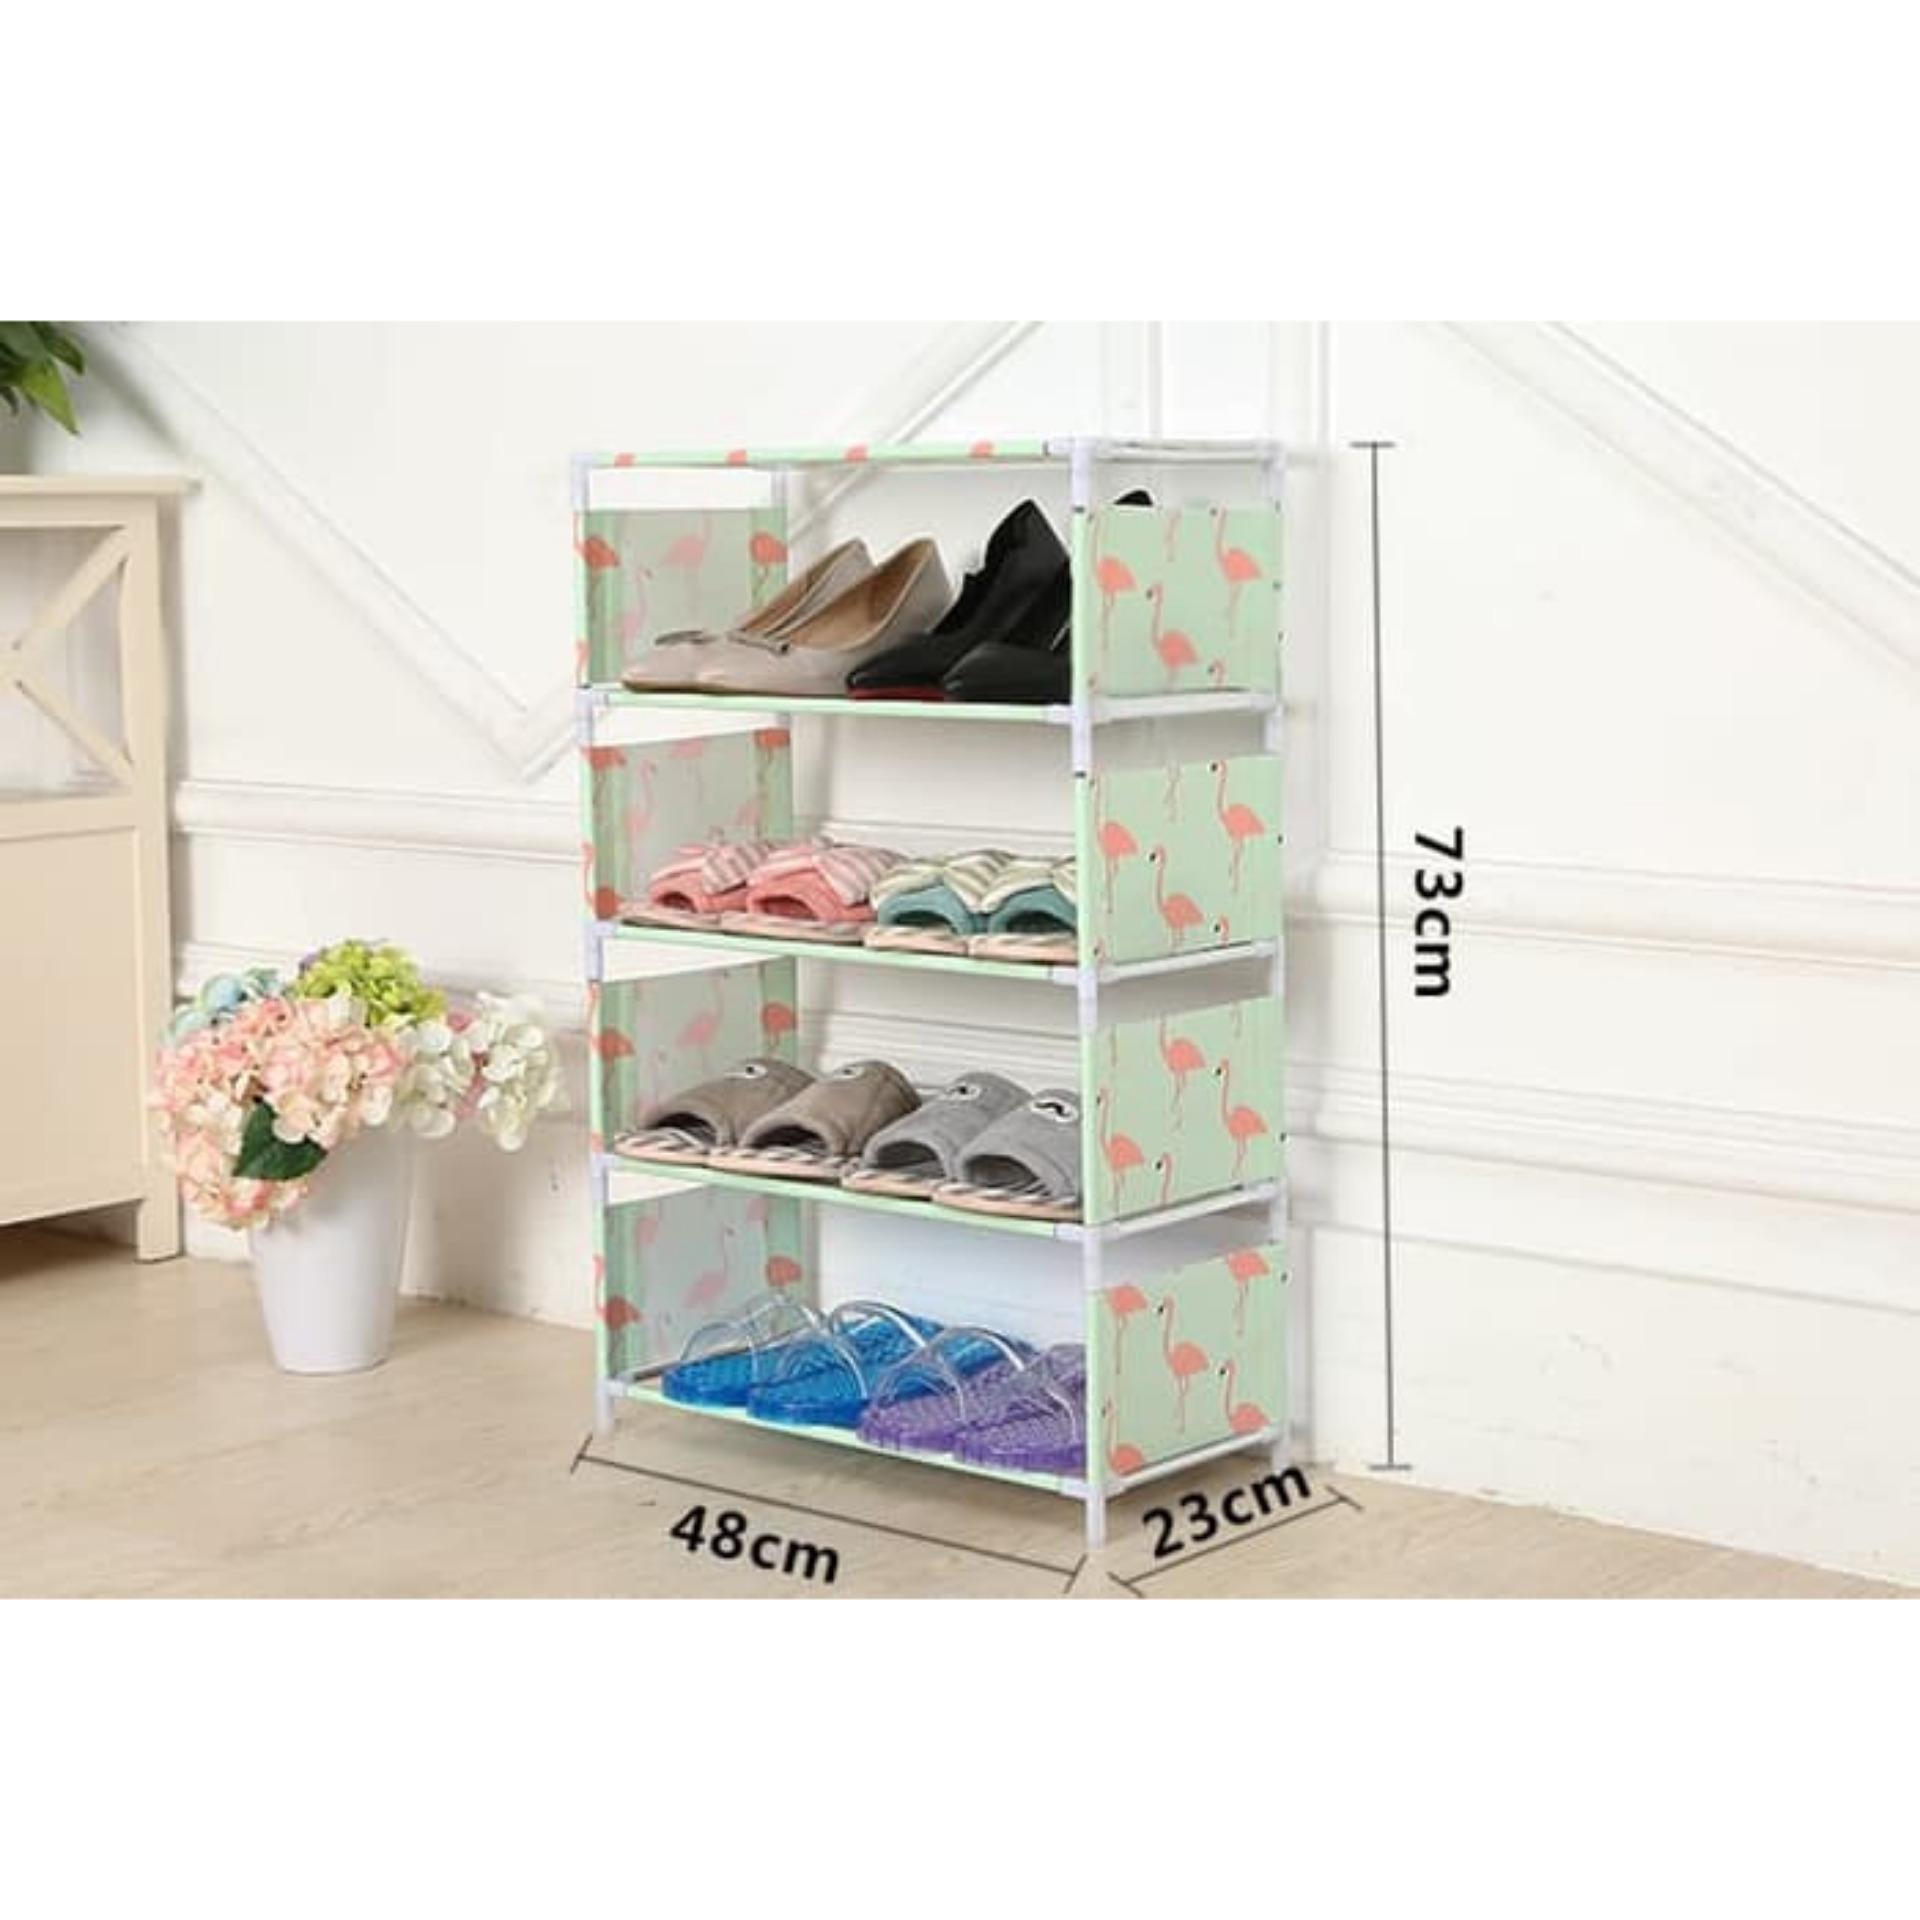 Lemari tempat penyimpanan lemari tempat sandal dan sepatu modern furniture Rak Sepatu Motif 5 Susun Tosca Flaminggo